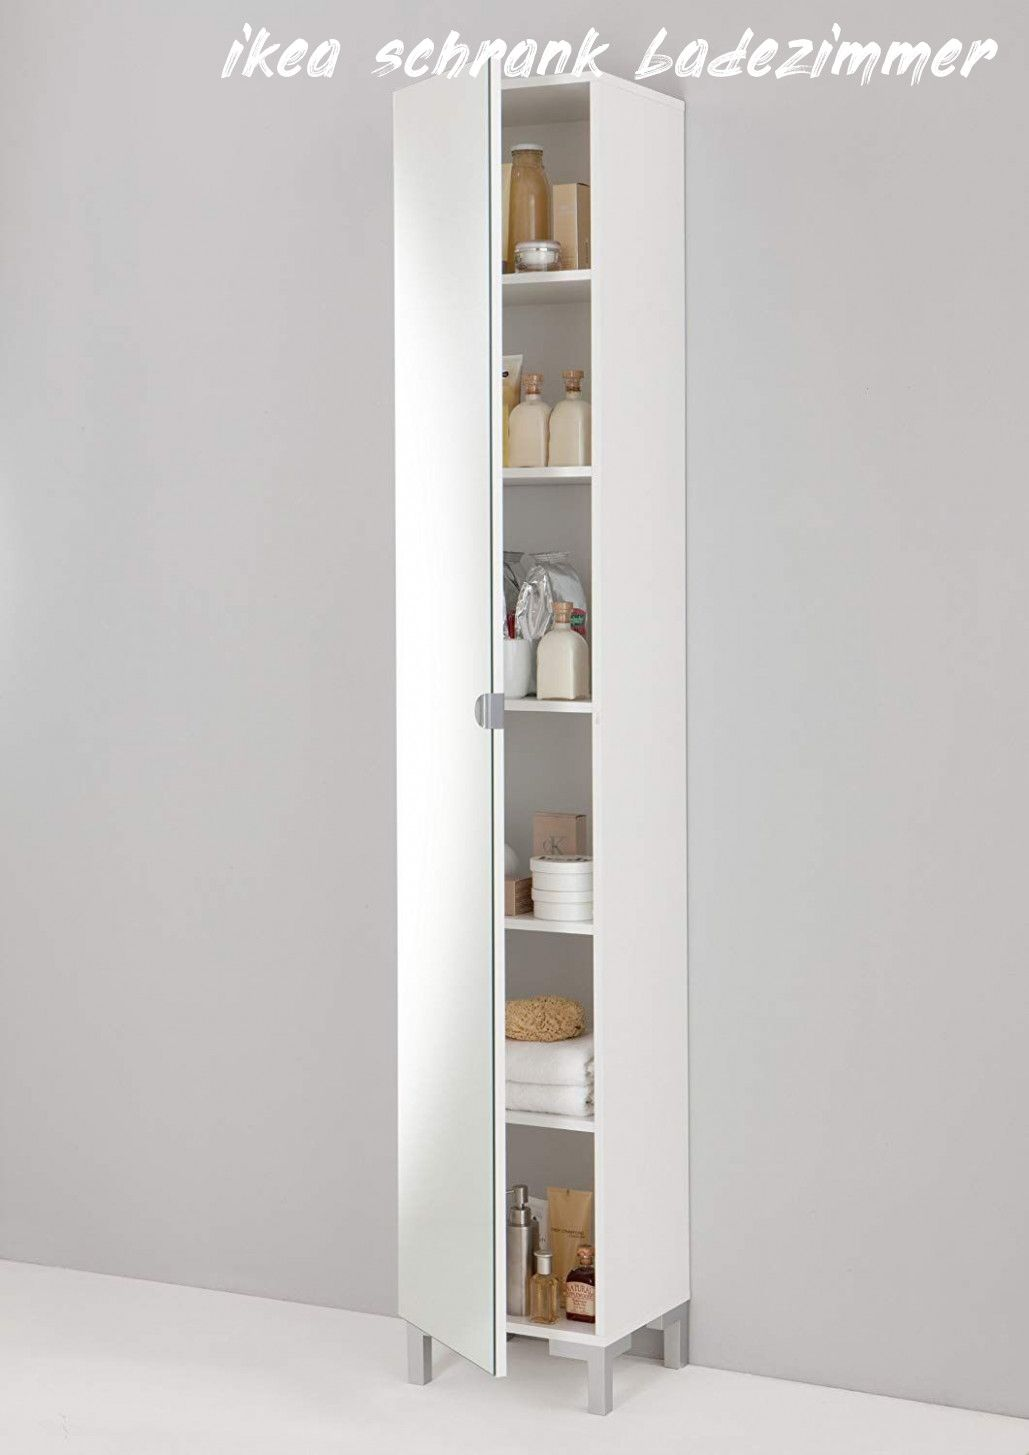 8 Ikea Schrank Badezimmer In 2020 Slim Bathroom Storage Cabinet White Bathroom Cabinets Bathroom Storage Cabinet